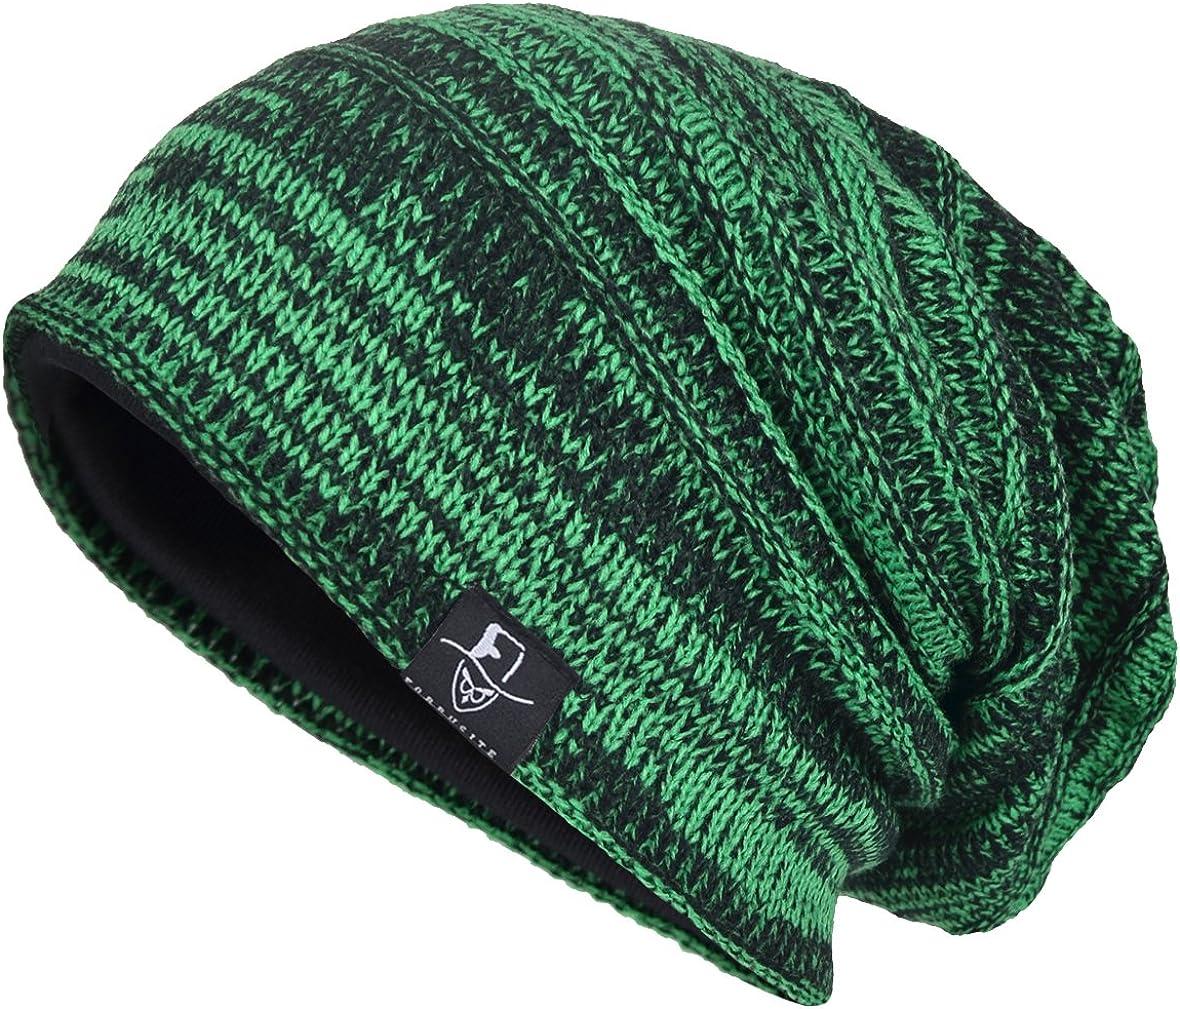 VECRY Men's Slouch Beanie Skull Cap Long Baggy Hip-Hop Winter Summer Hat